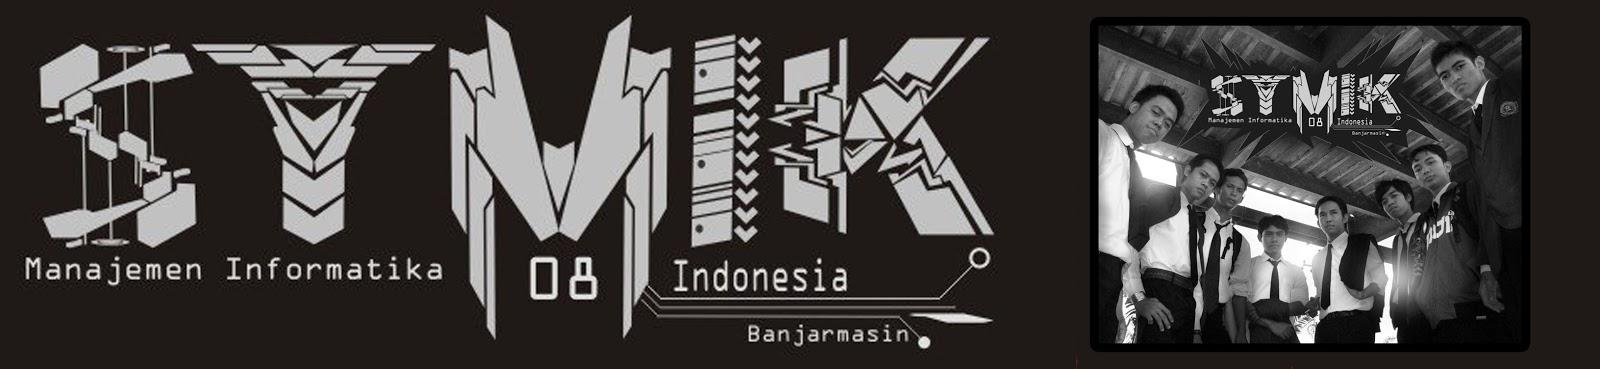 STMIK Indonesia Banjarmasin